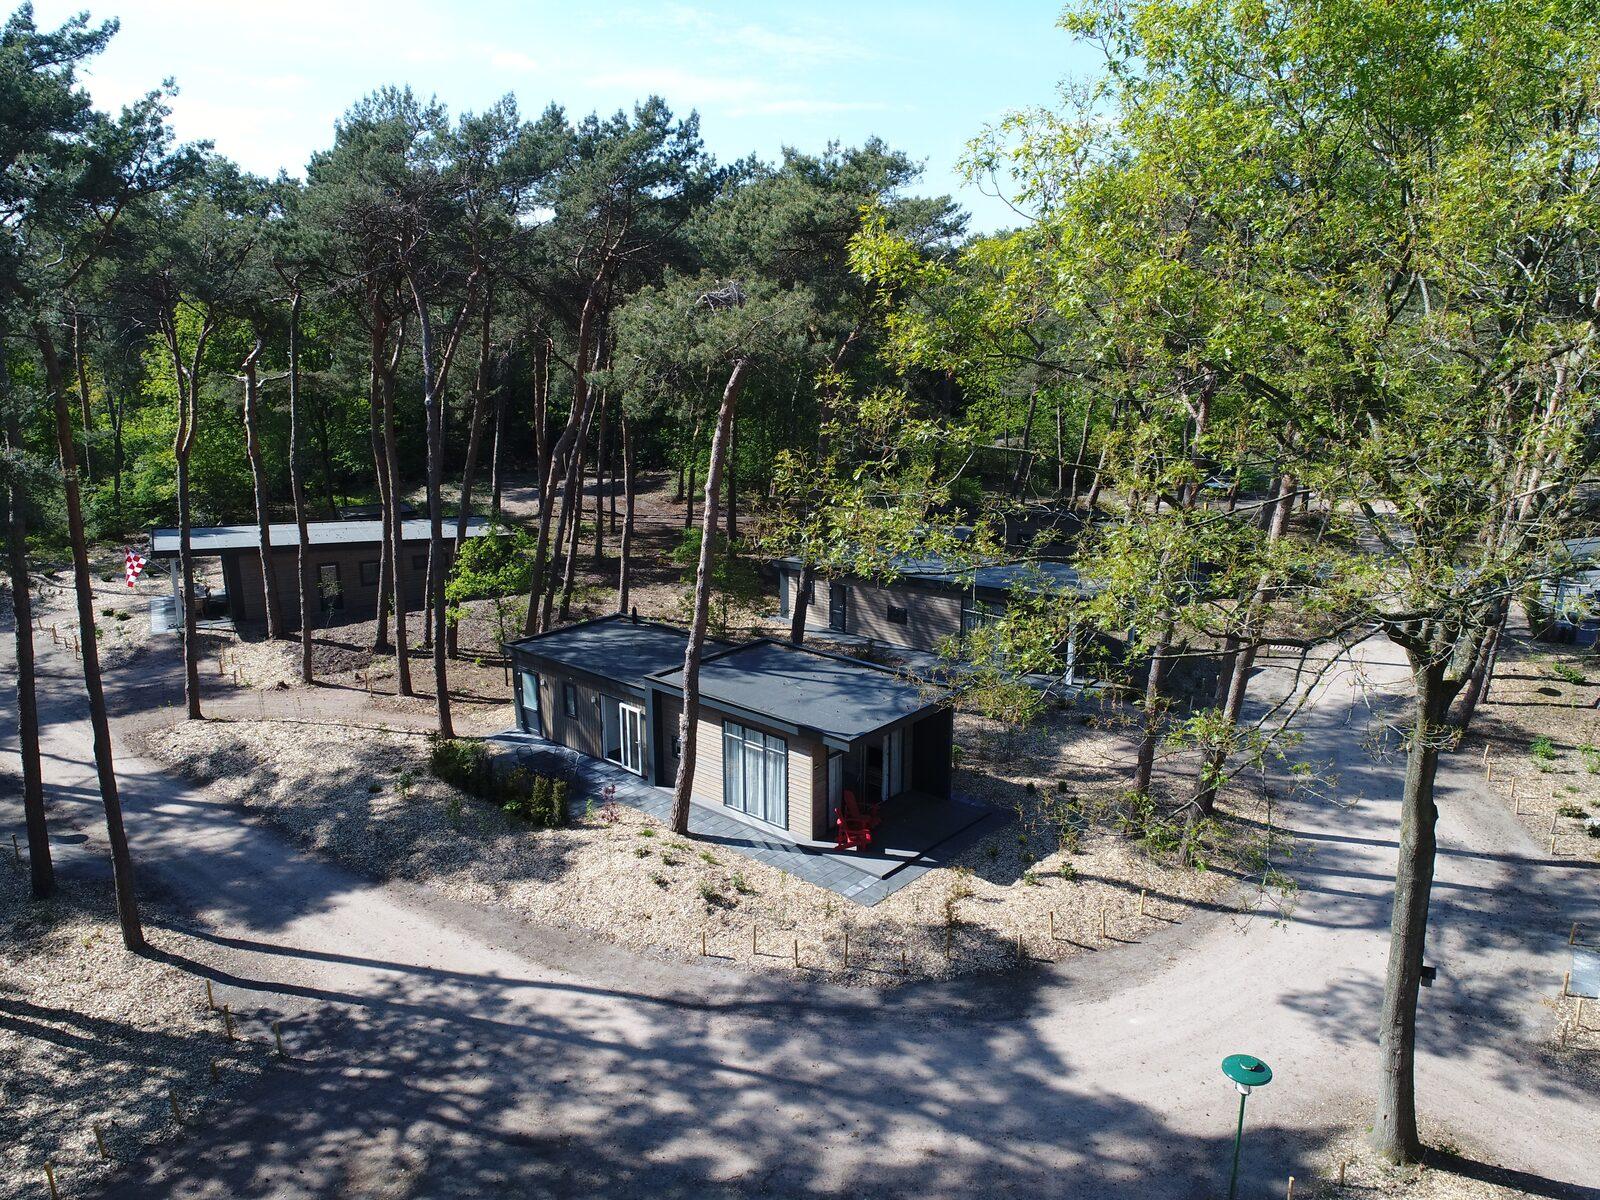 Bospark Beltieshoeve 477